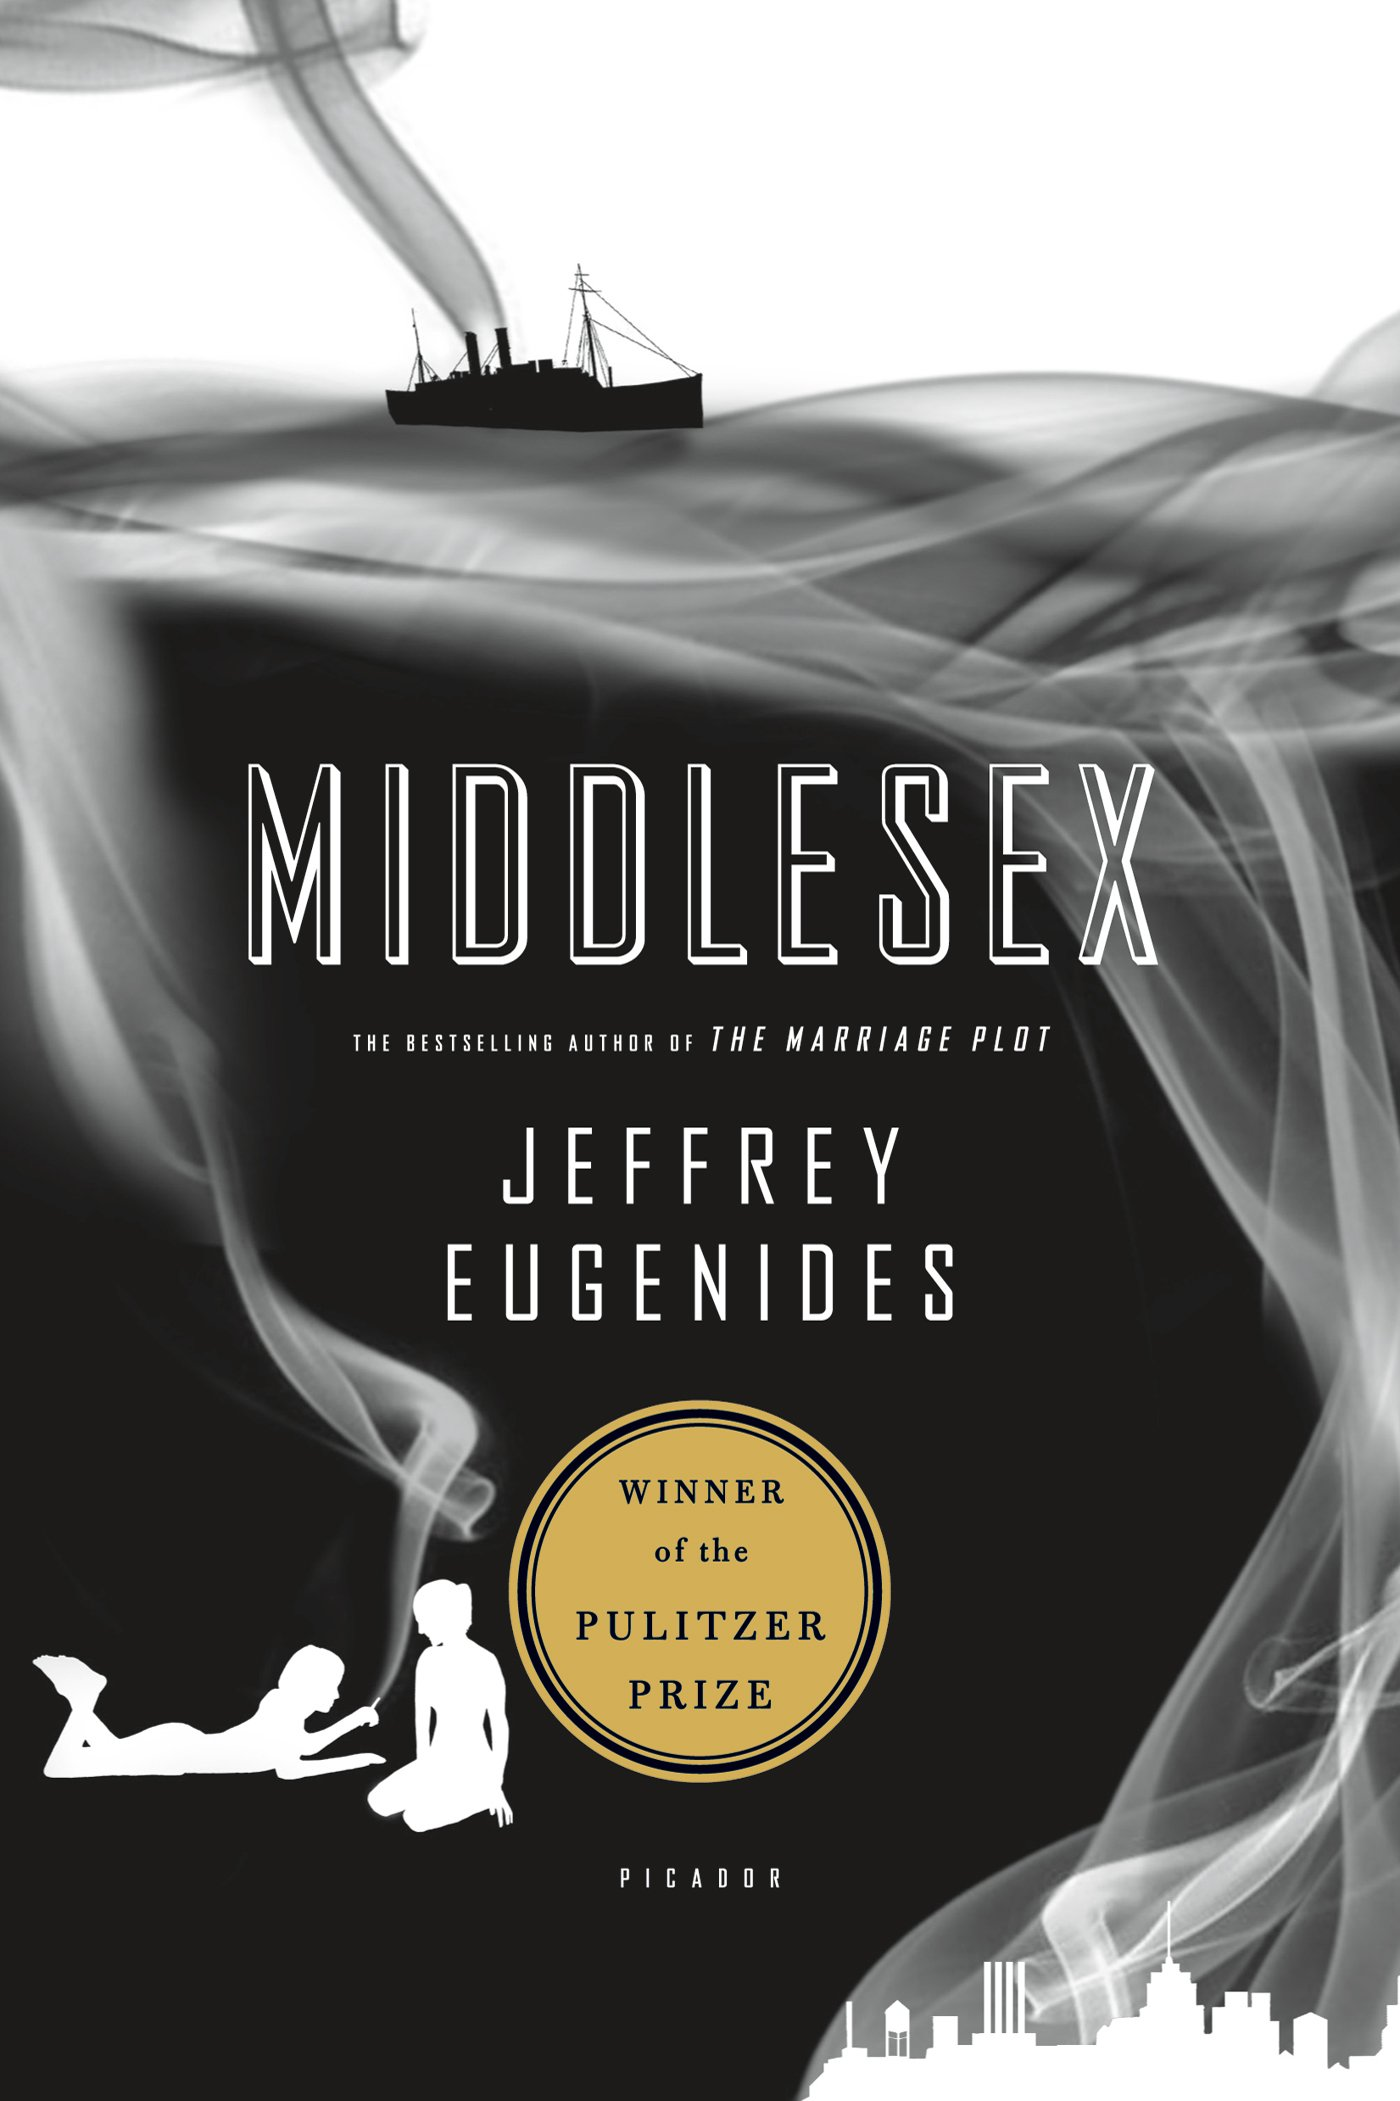 Eugenides' Middlesex